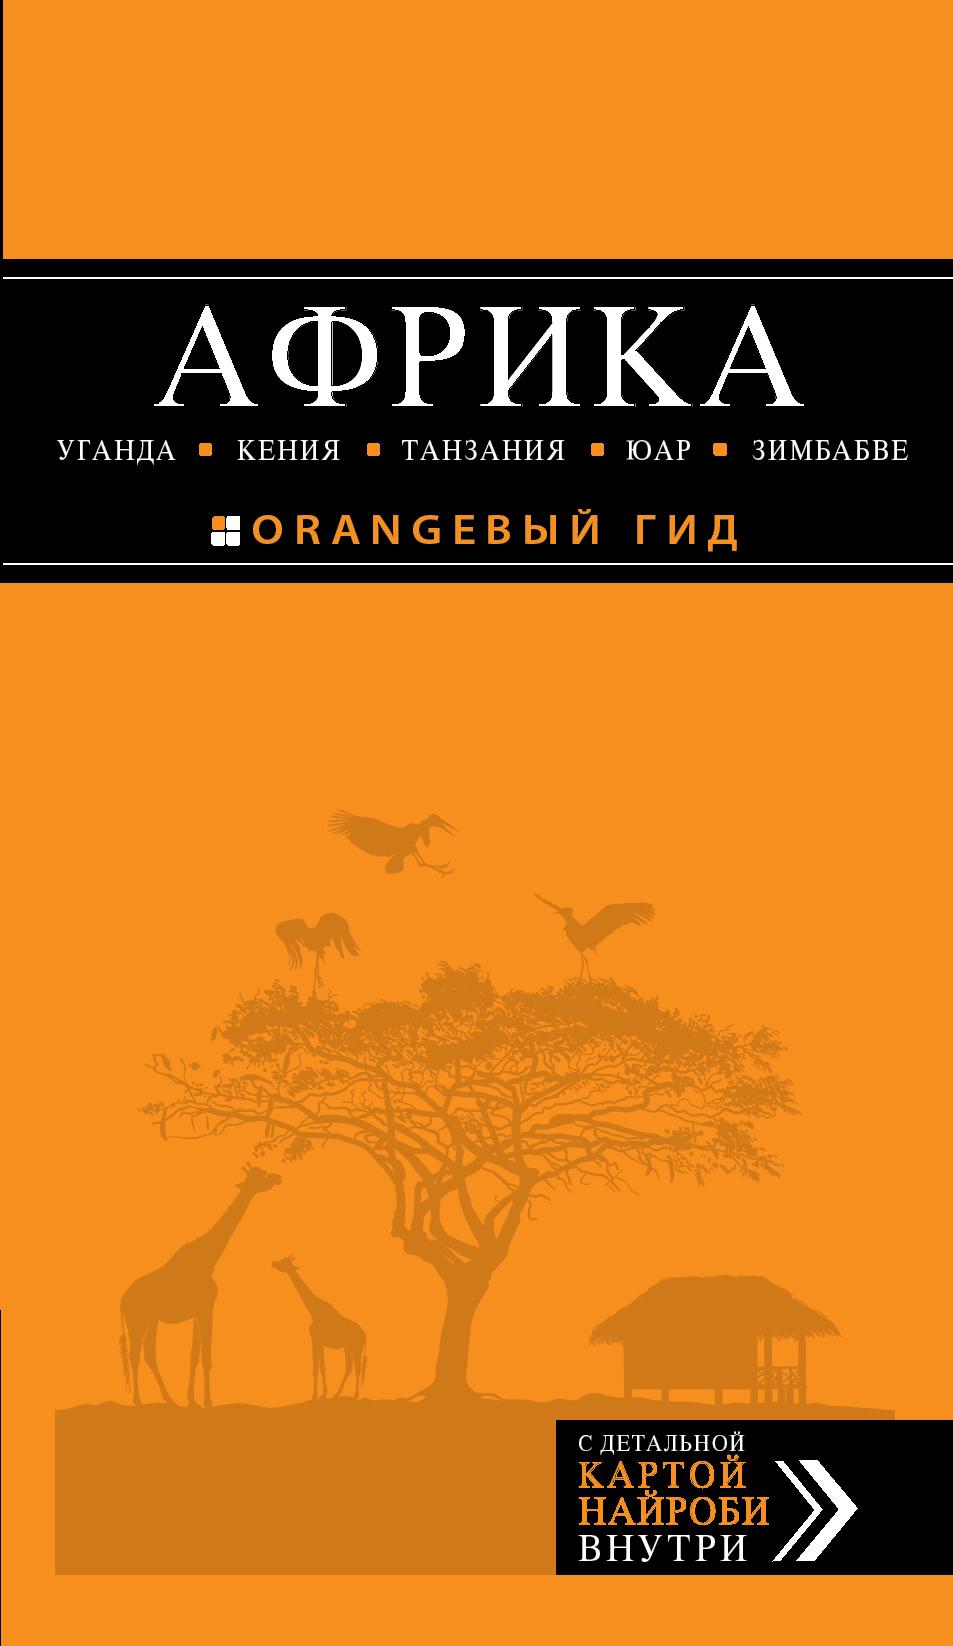 АФРИКА: Уганда, Кения, Танзания, ЮАР, Зимбабве